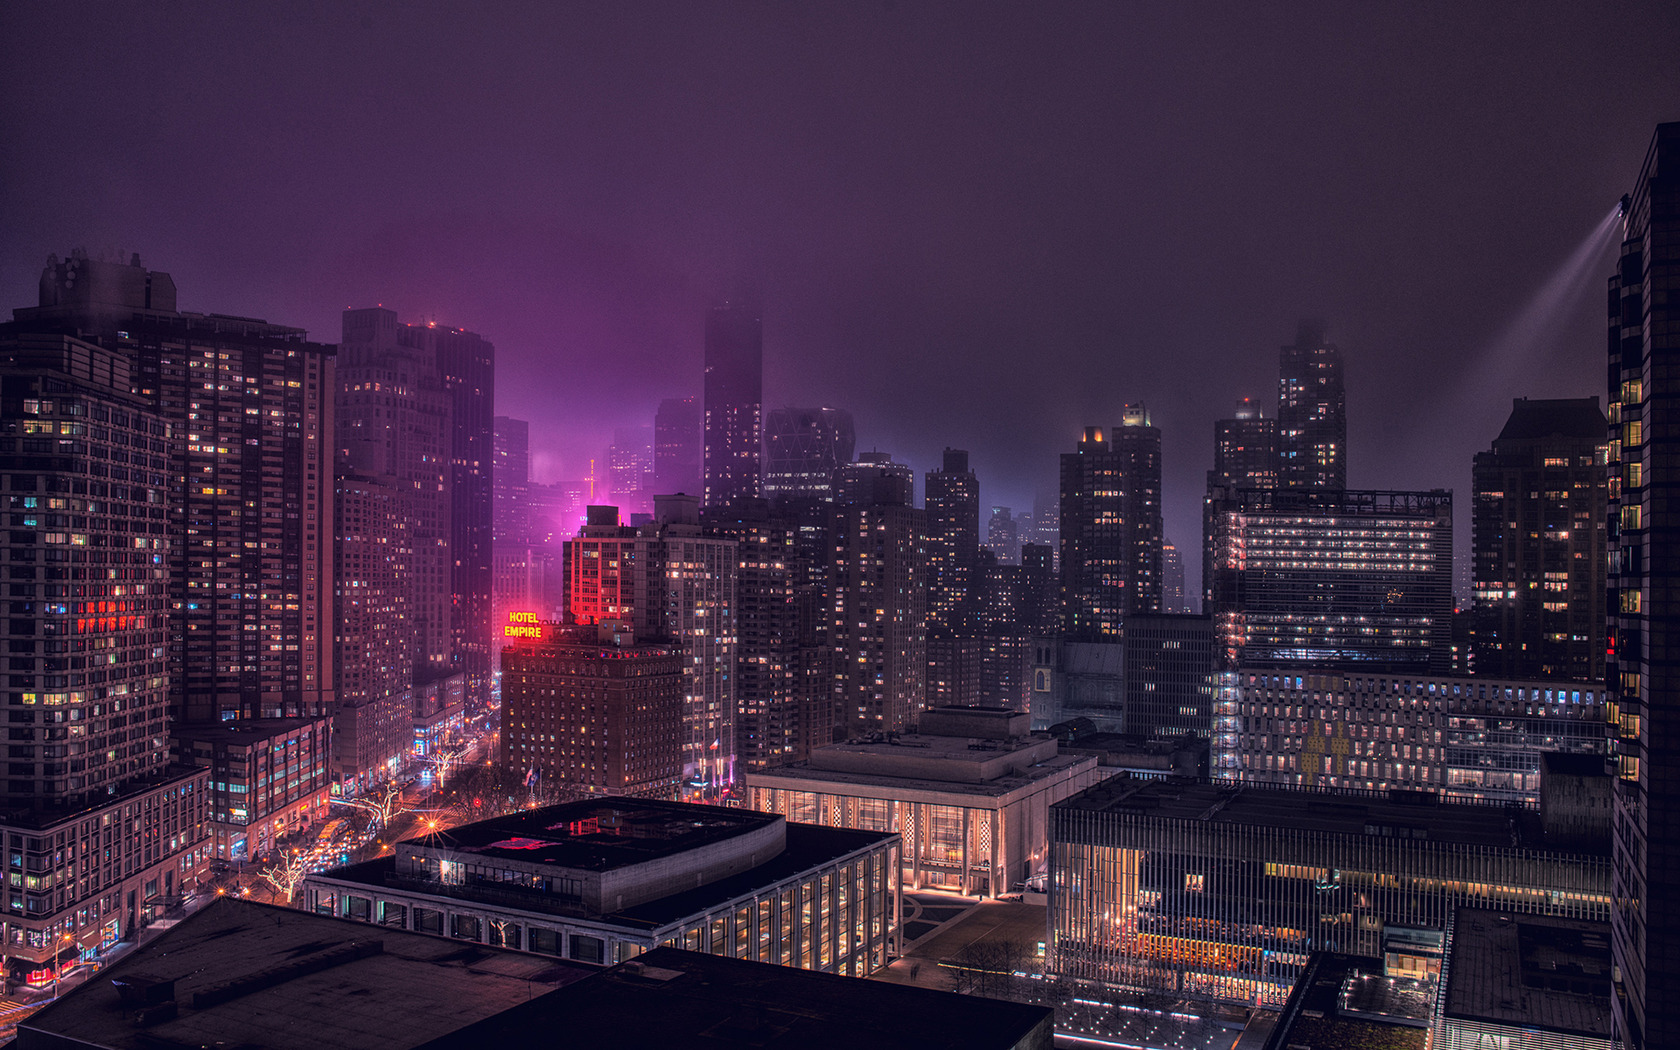 New York at night wallpaper 18275 1680x1050